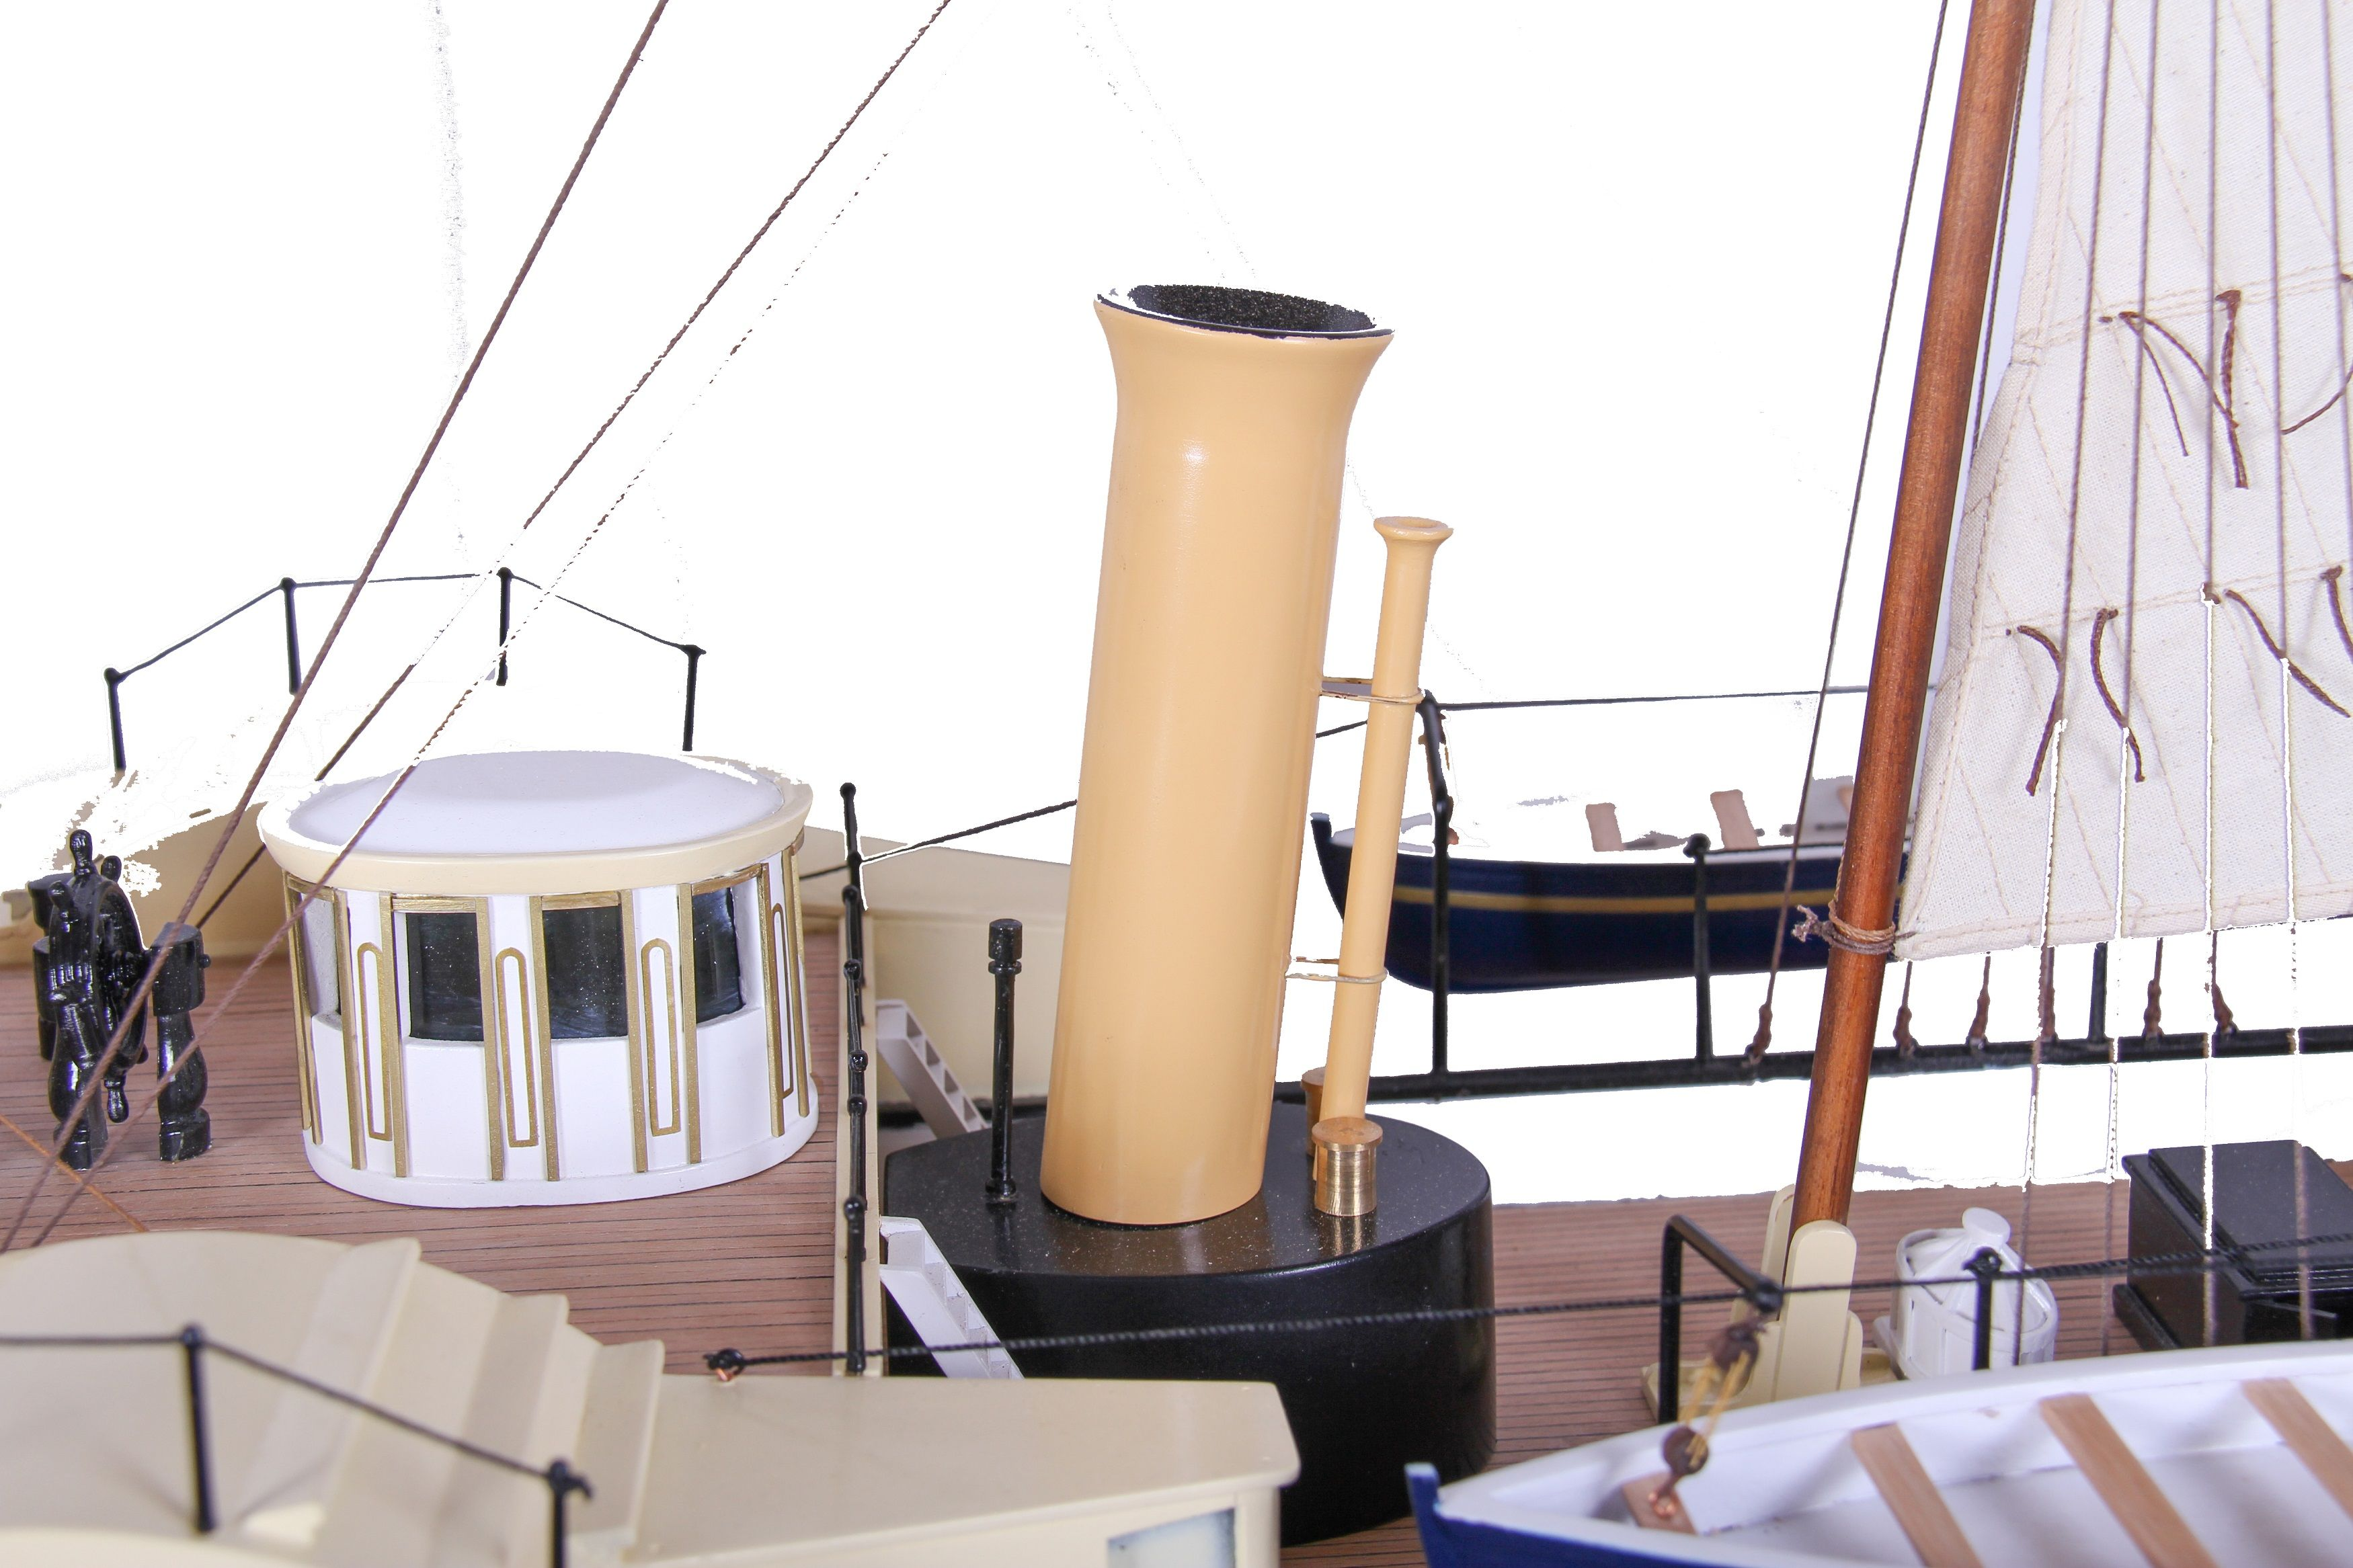 1689-9551-Royal-Yacht-HMS-Alberta